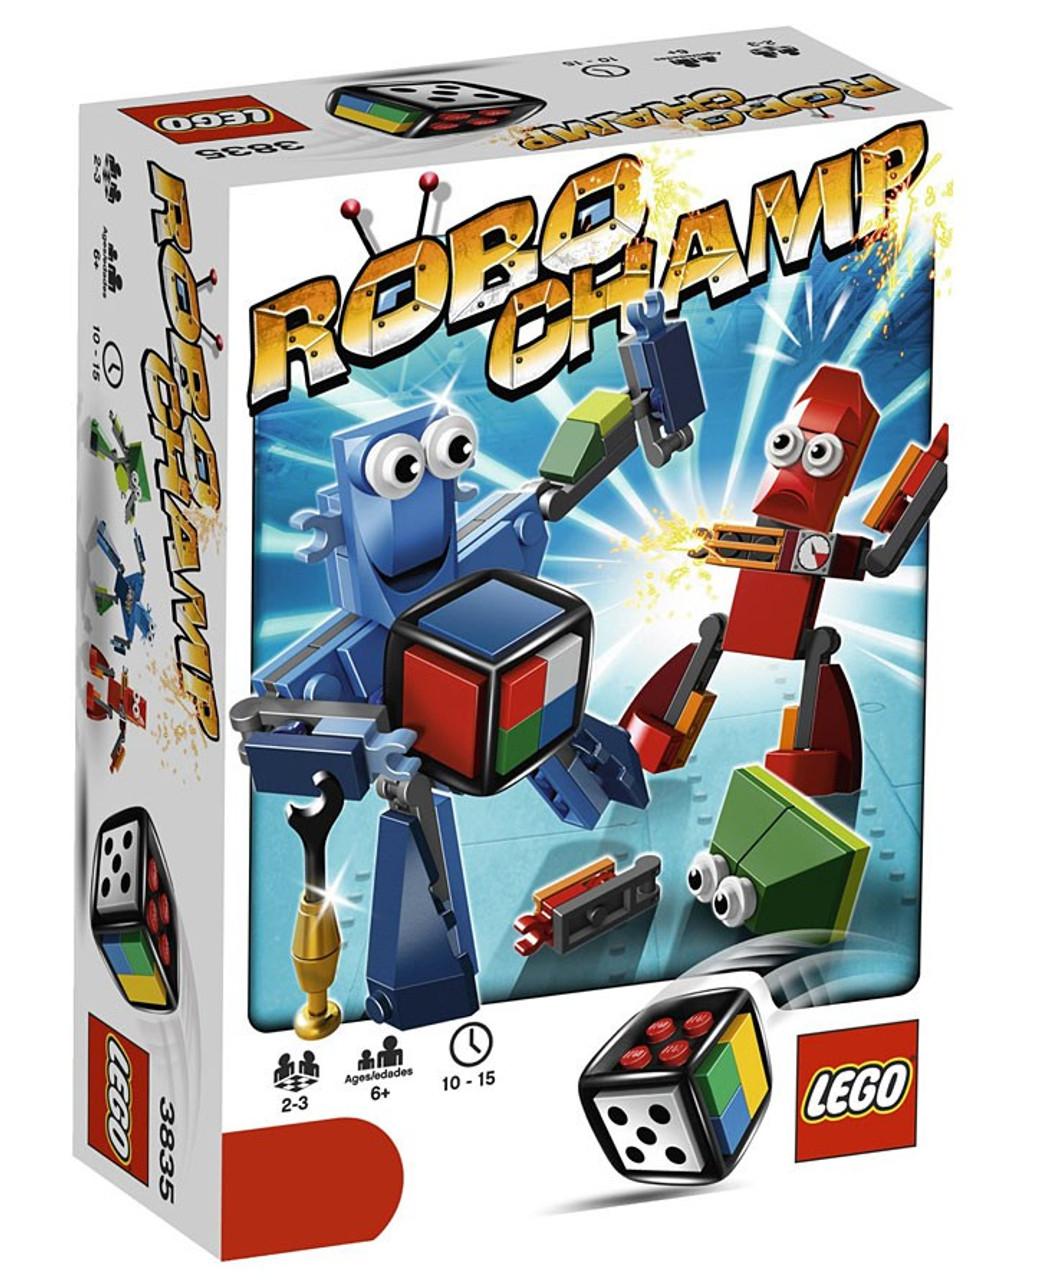 LEGO Games Robo Champ Board Game #3835